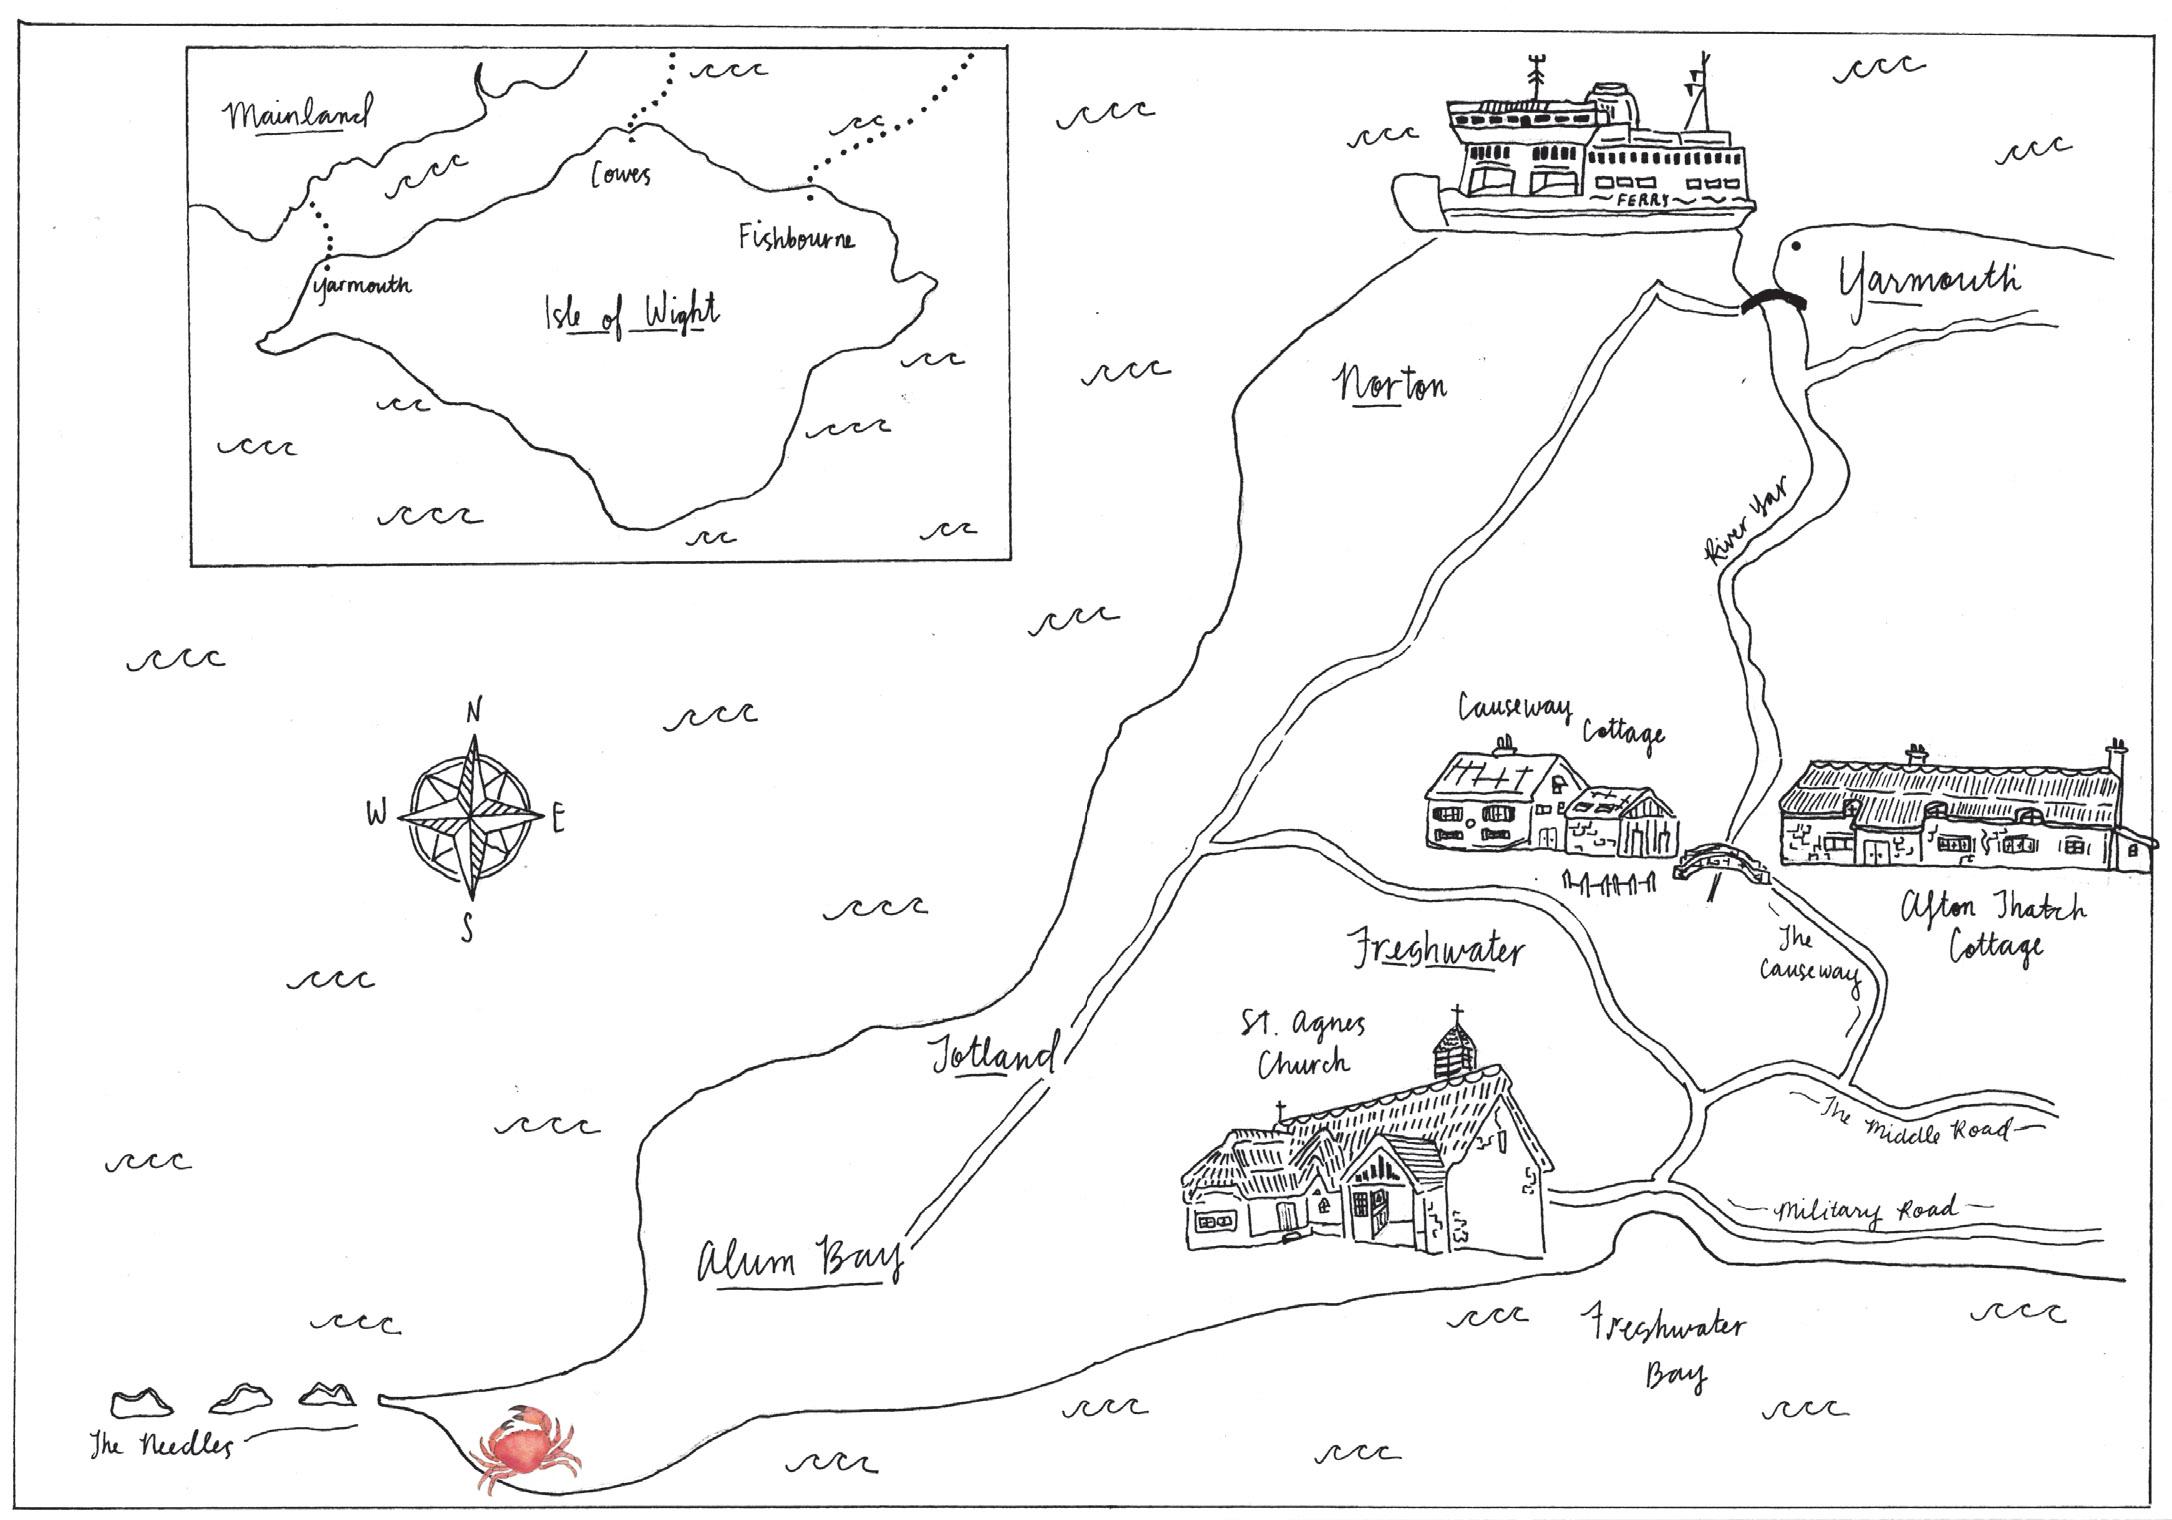 Wedding Map, Isle of Wight